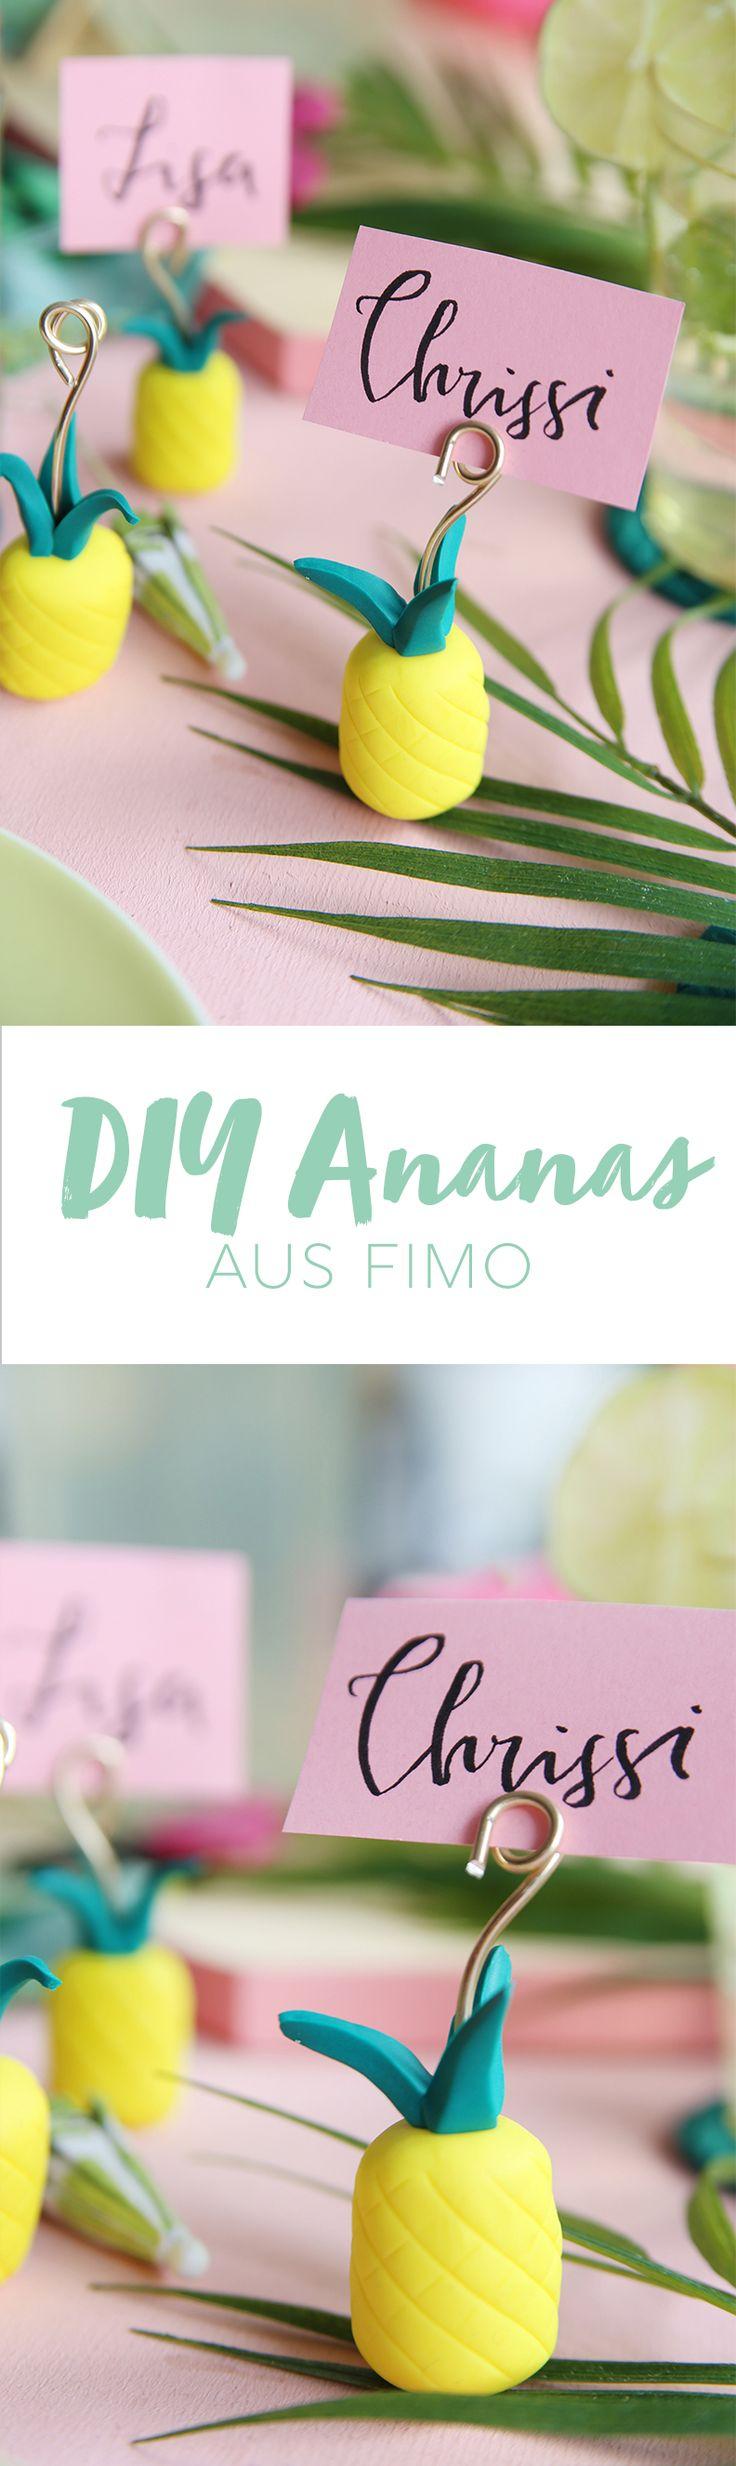 Kreative DIY-Idee aus Fimo: Fimo-Ananas als Tischkarten- oder Fotohalter   – ~ DIY Inspirationen ~